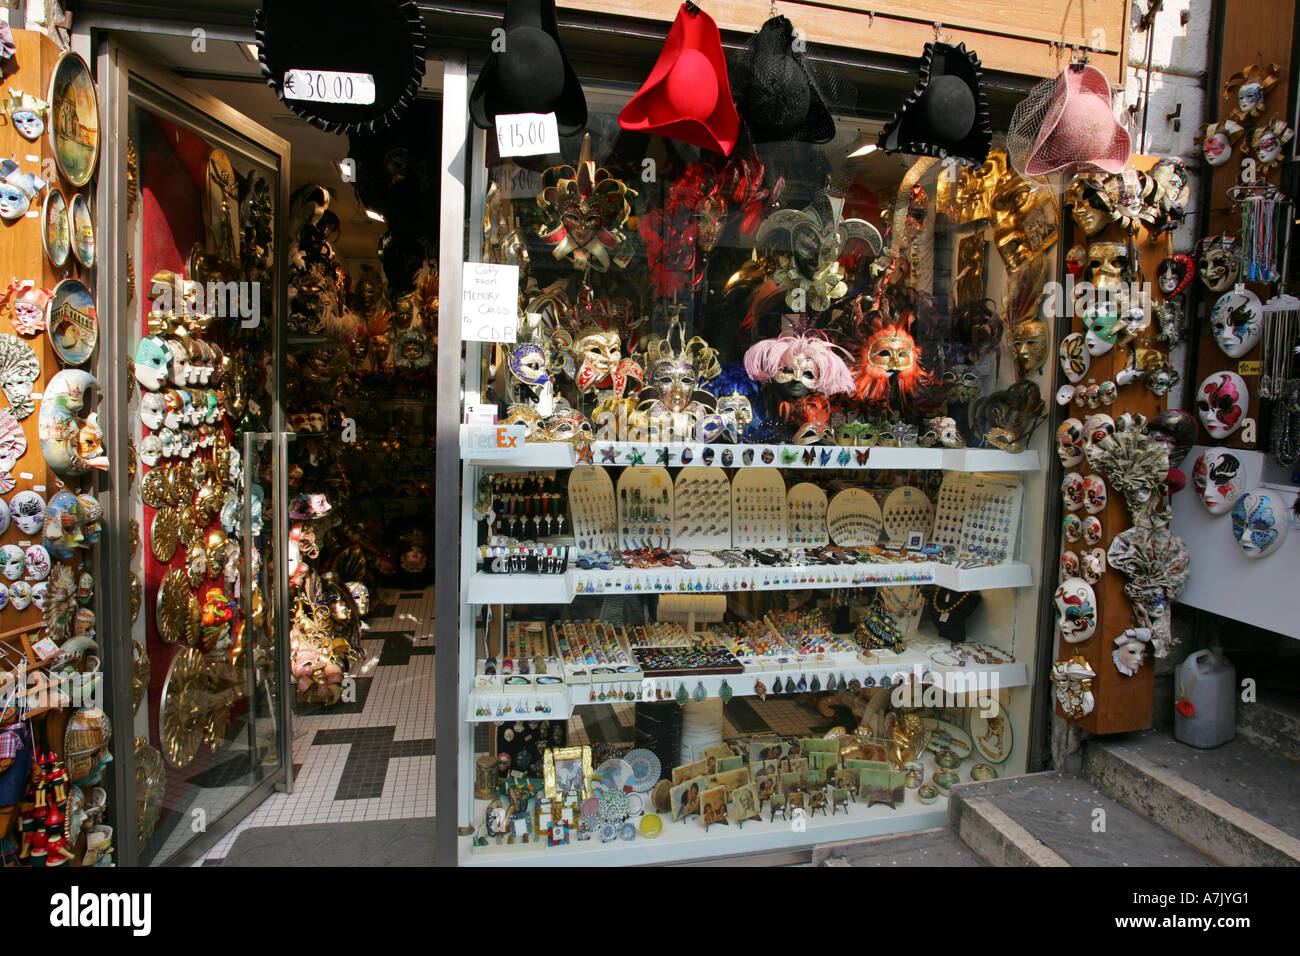 leuchtend bunte venedig tourist souvenir shop in der n he von rialto br cke bedeckt carnivale. Black Bedroom Furniture Sets. Home Design Ideas